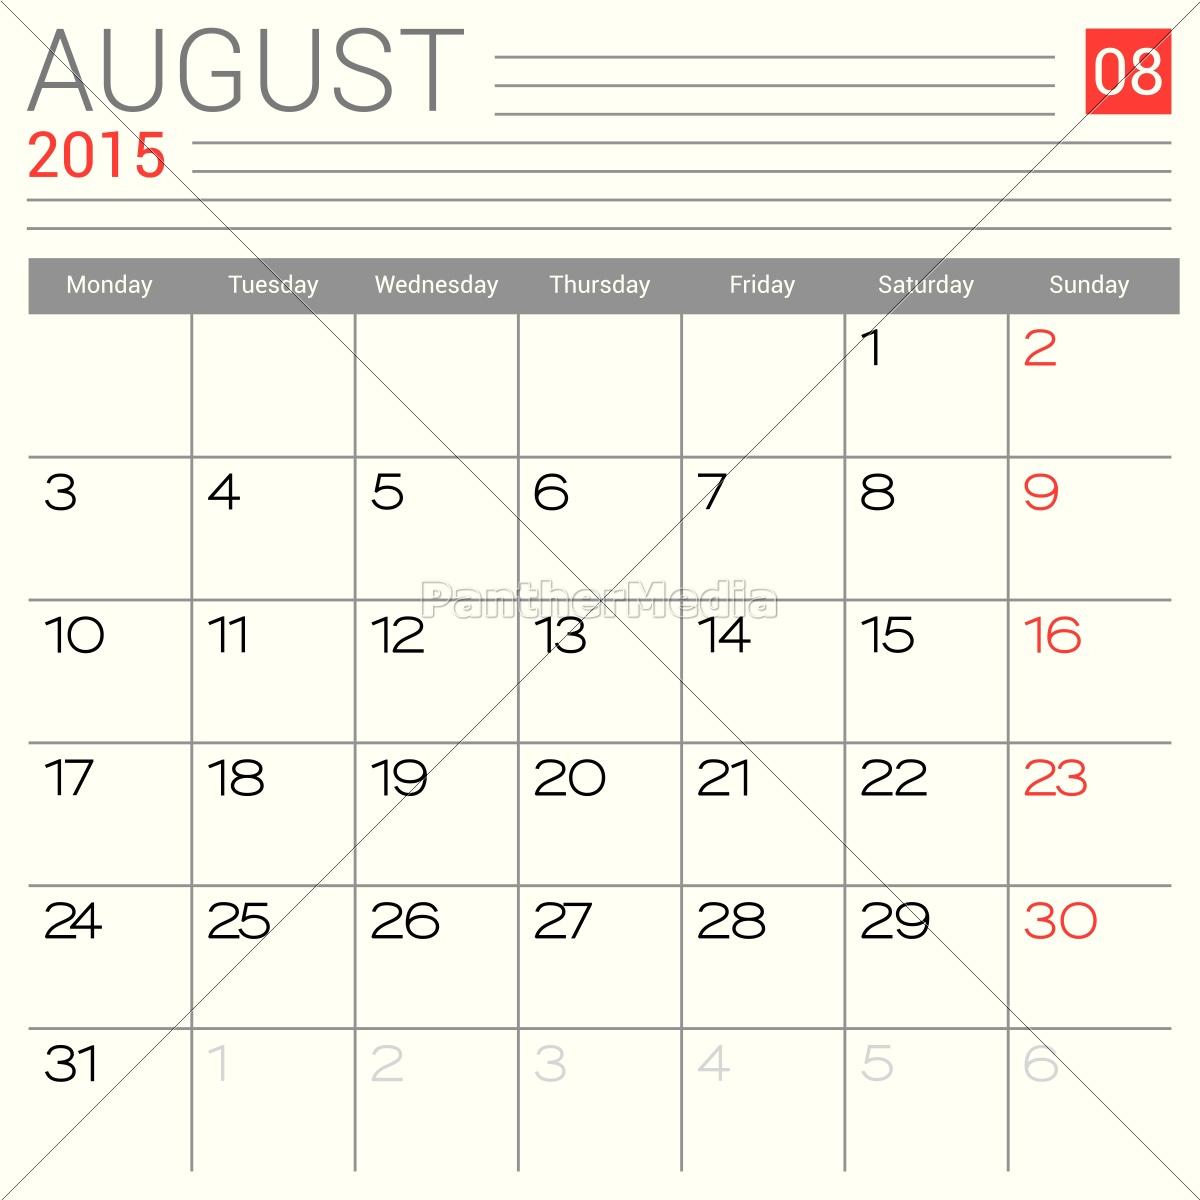 august, 2015, kalender - 12956622